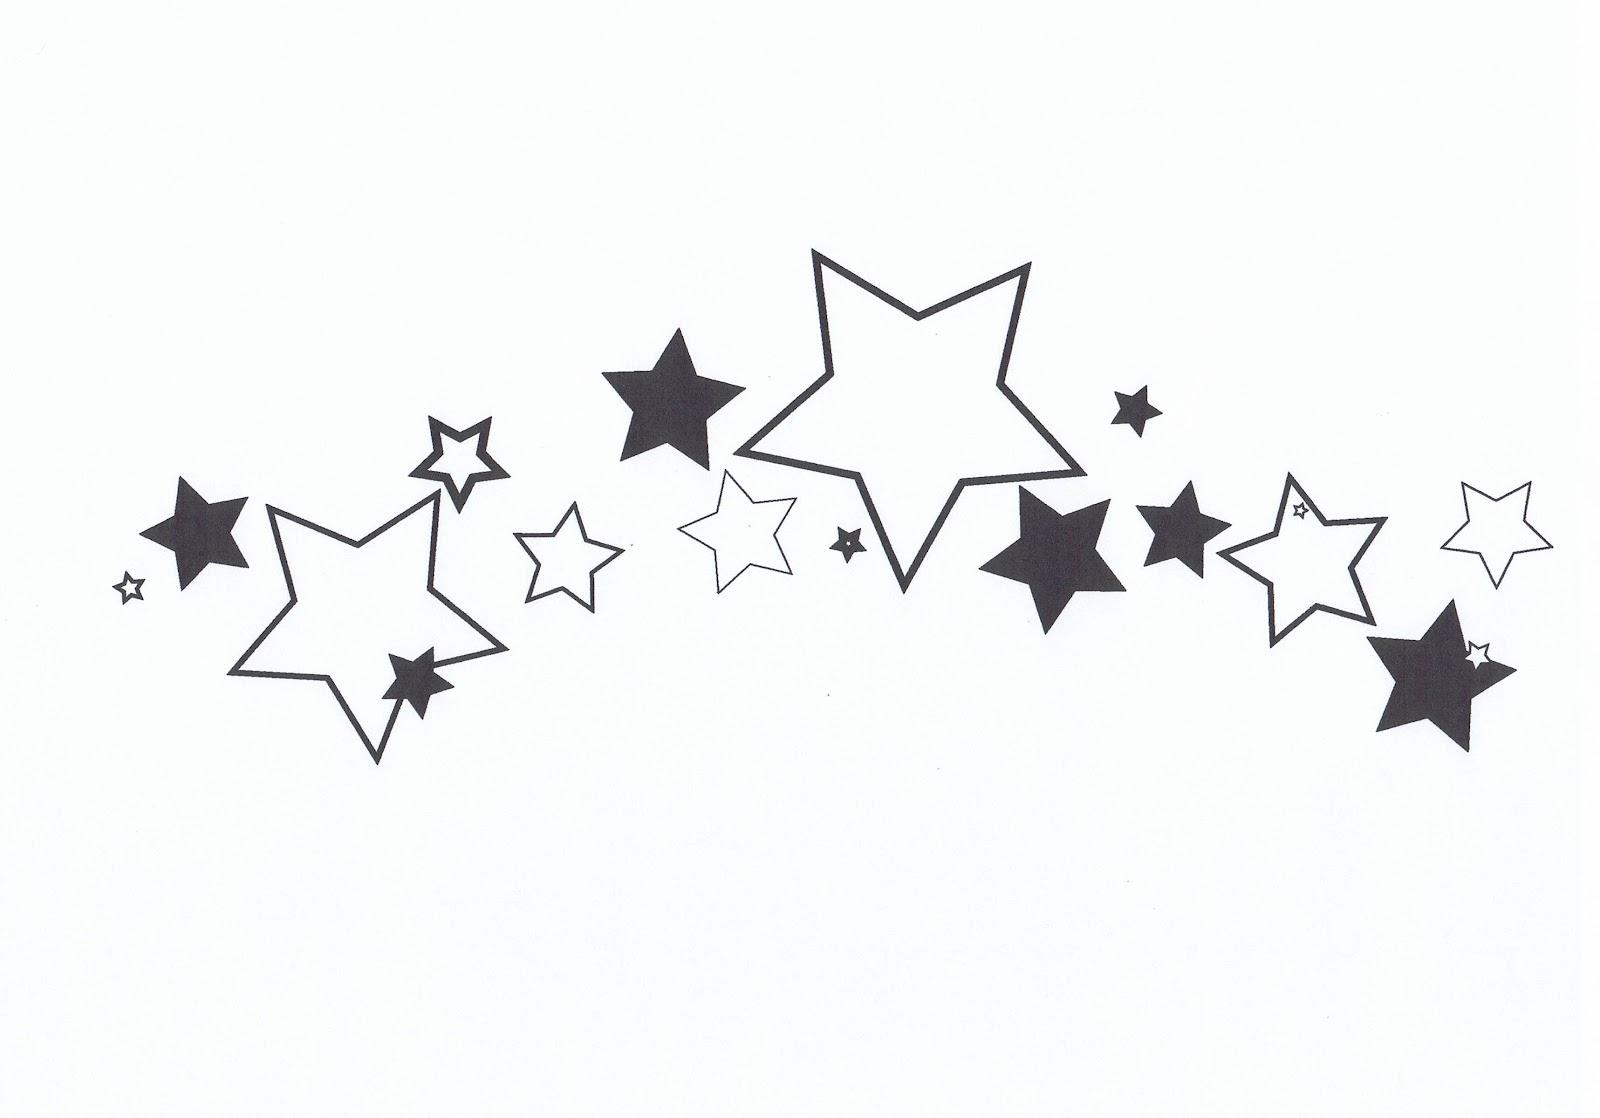 Shikisai Paloroid Dream Tattoo